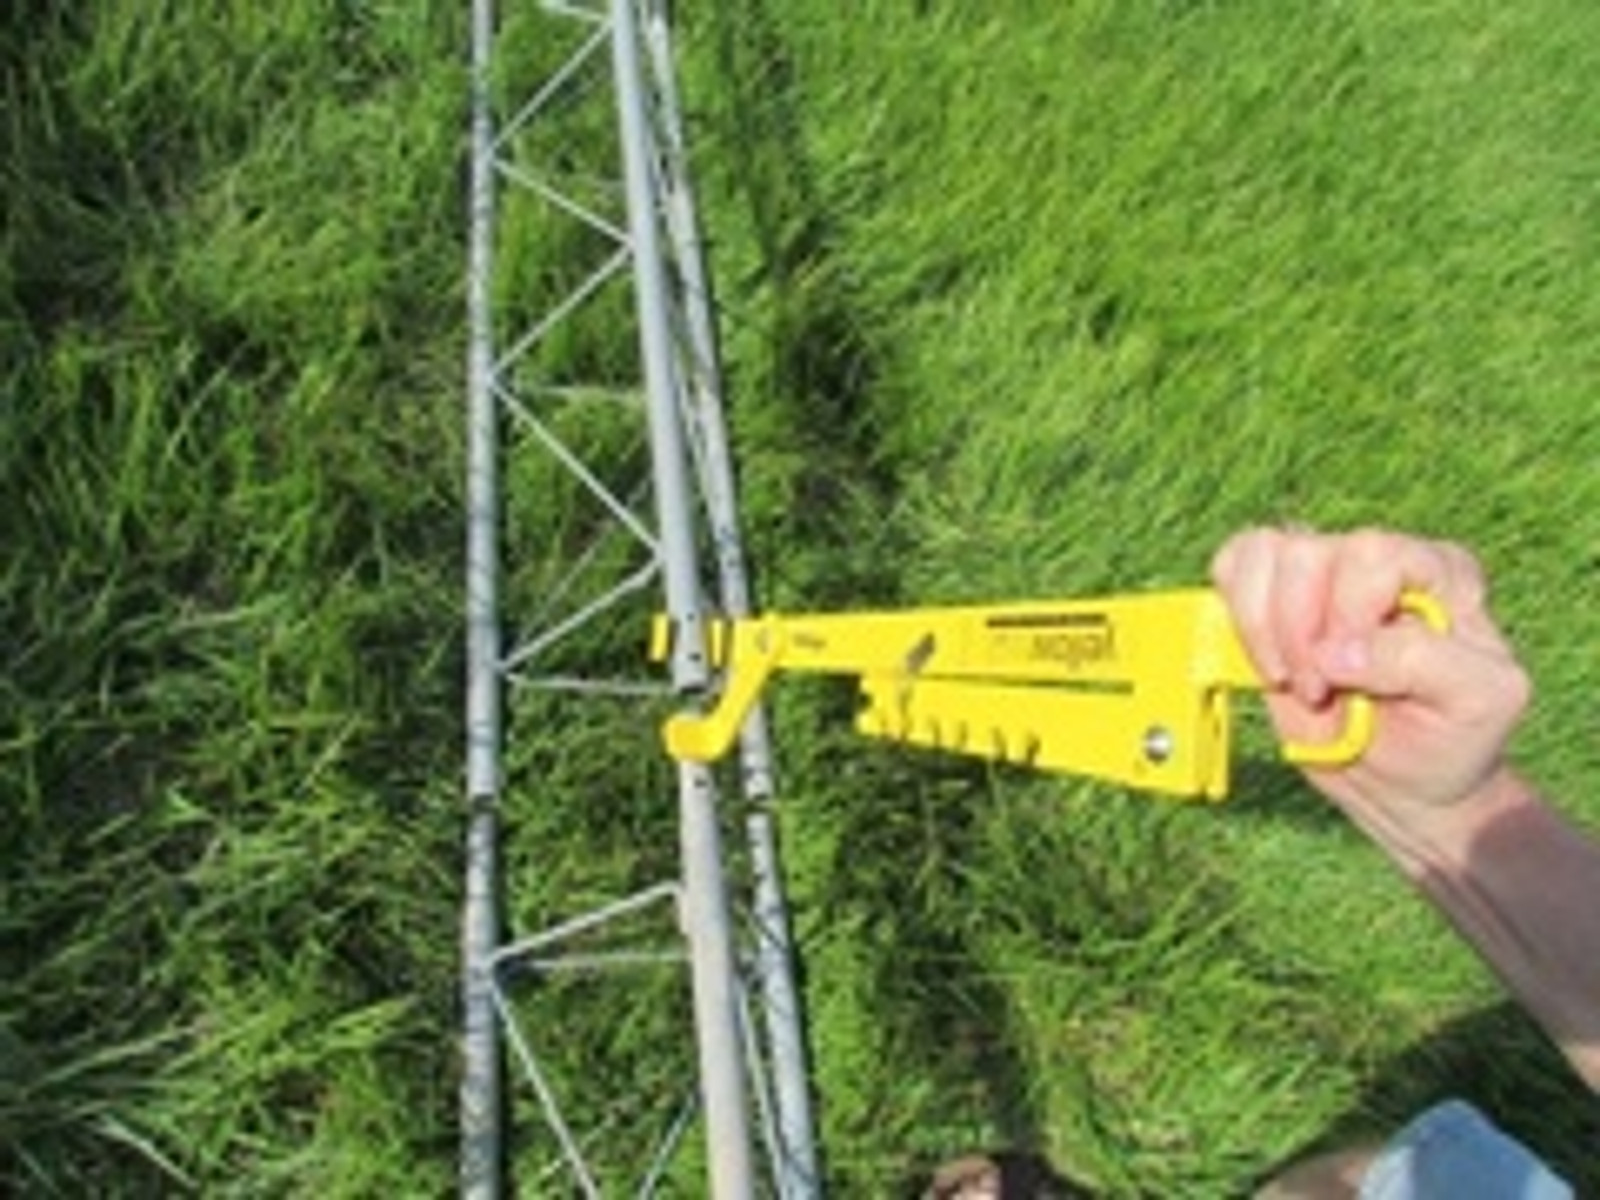 Yellowjack tower tool with lanyard